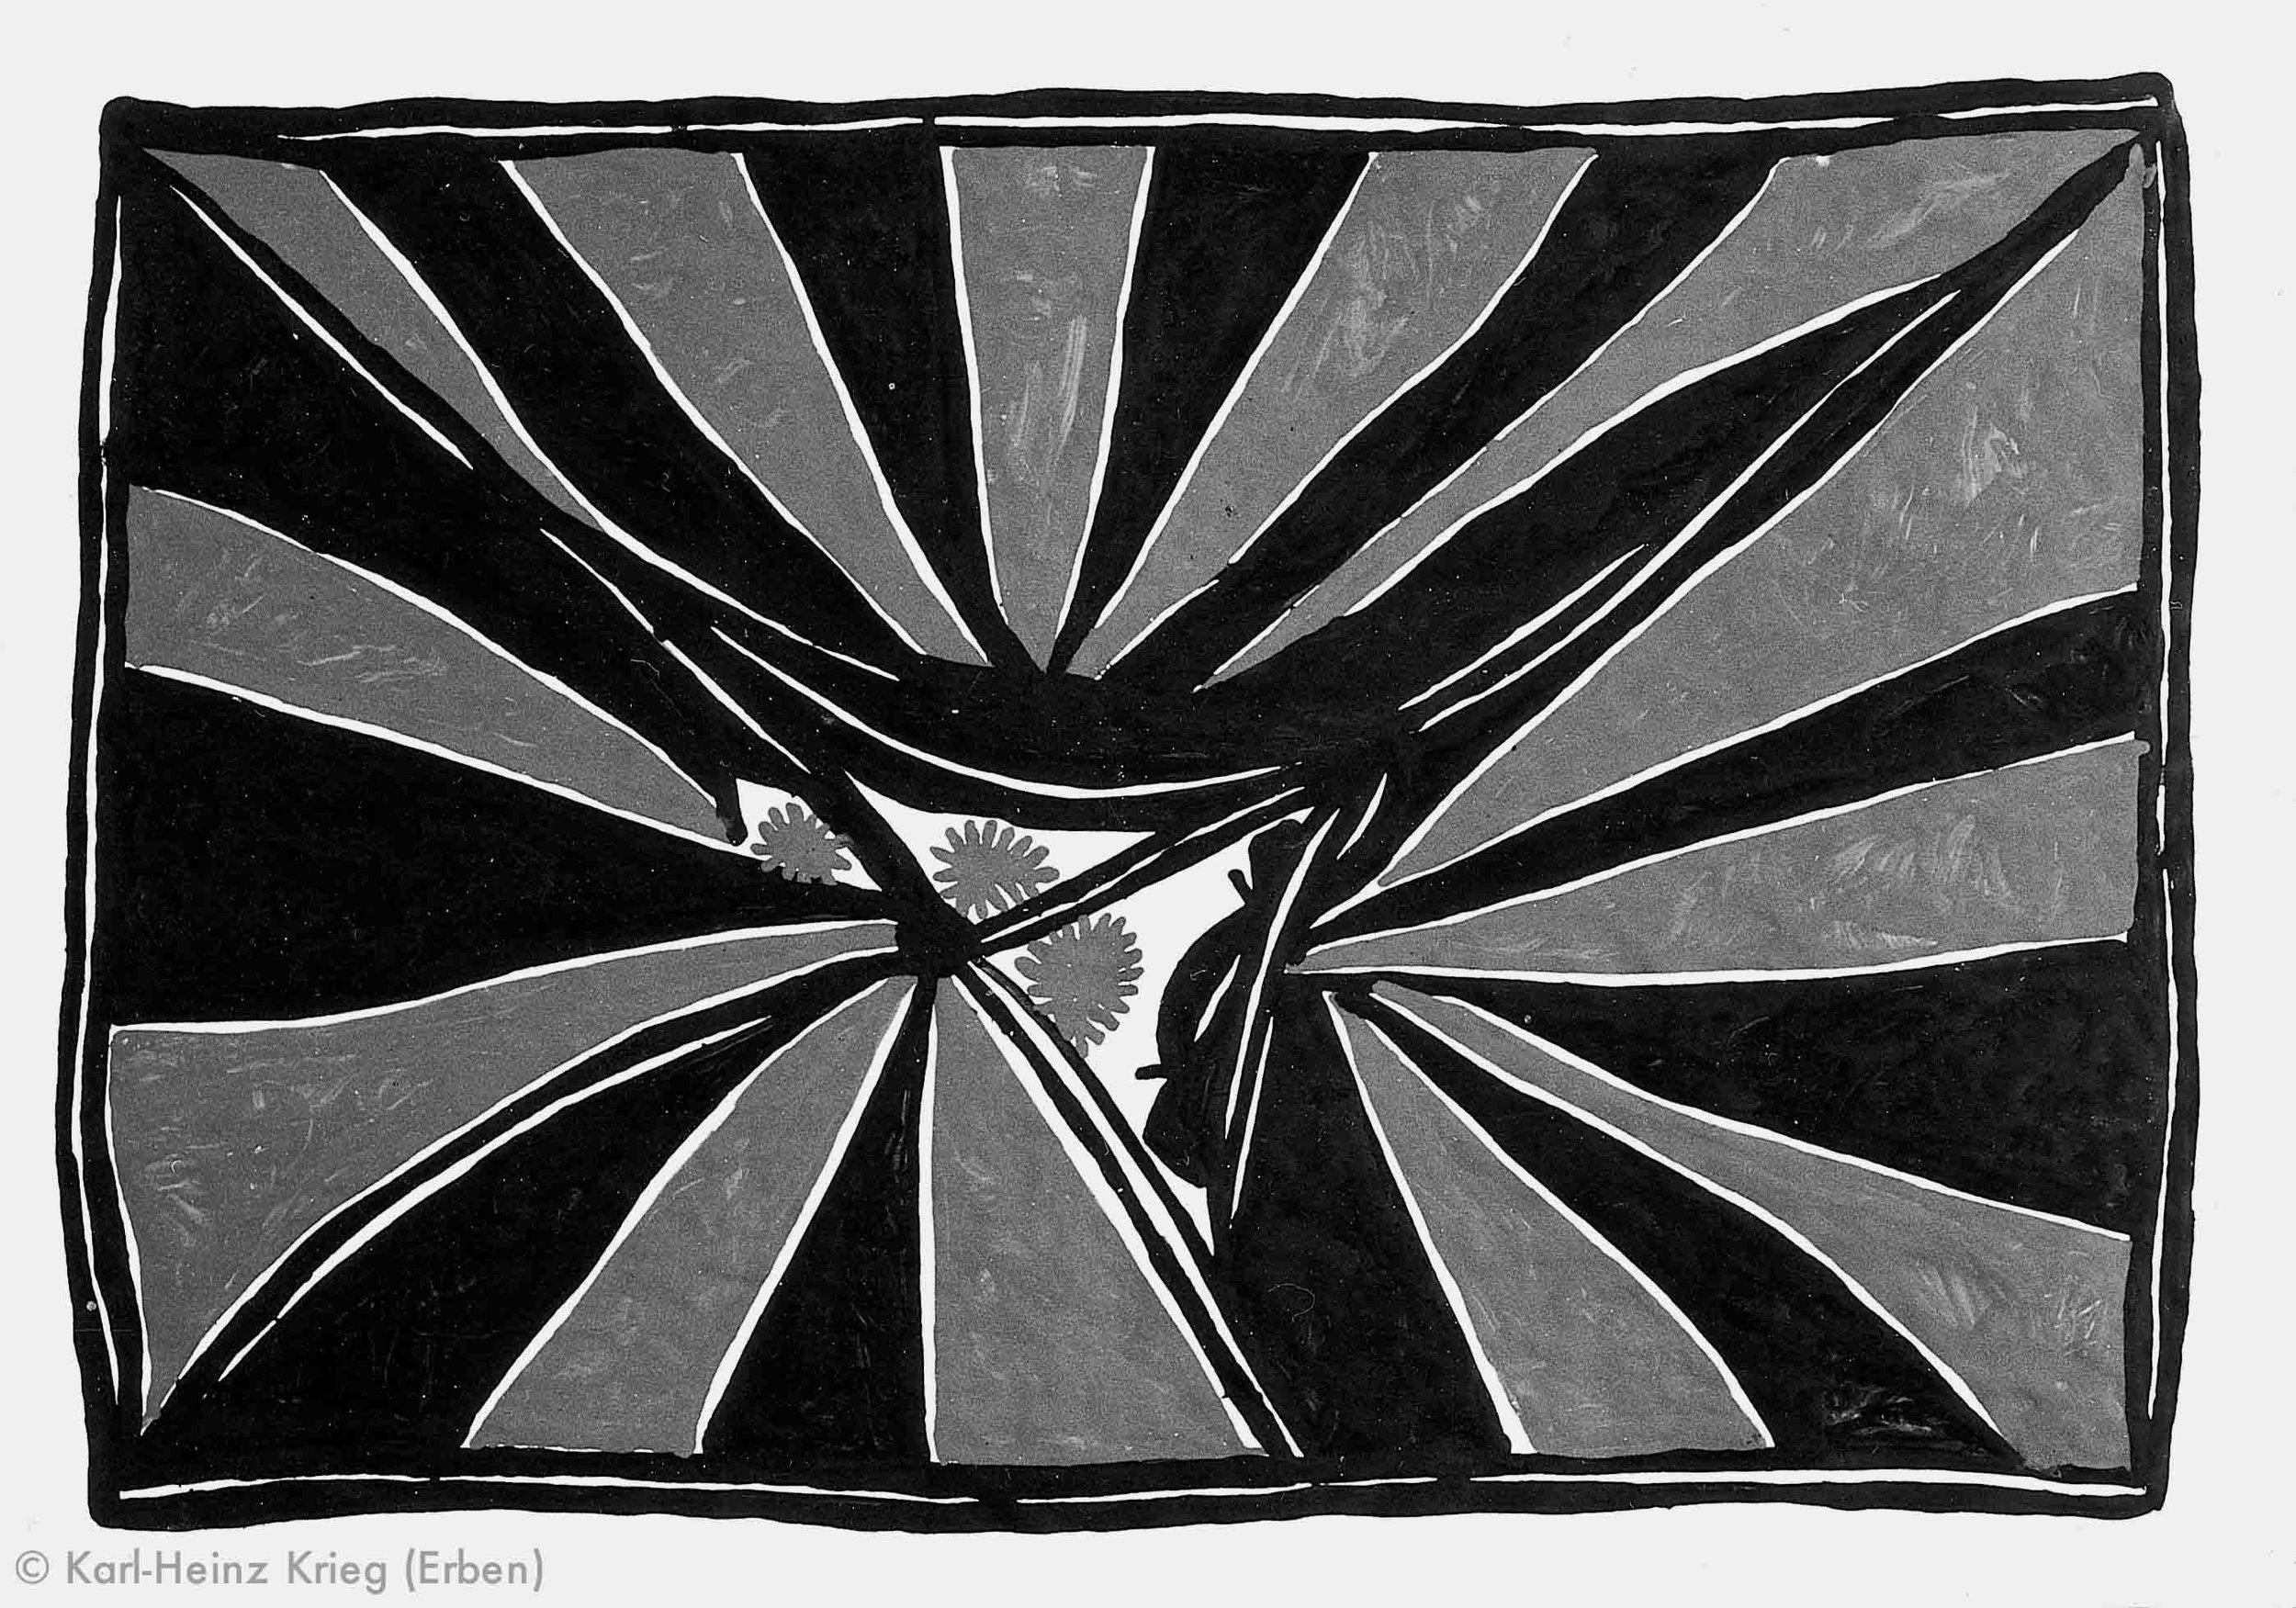 Gaou Béavogi Koiwölözeghei, 1990 Dispersionsfarbe/Papier 59 x 42 cm Werknr. 6-1990/65